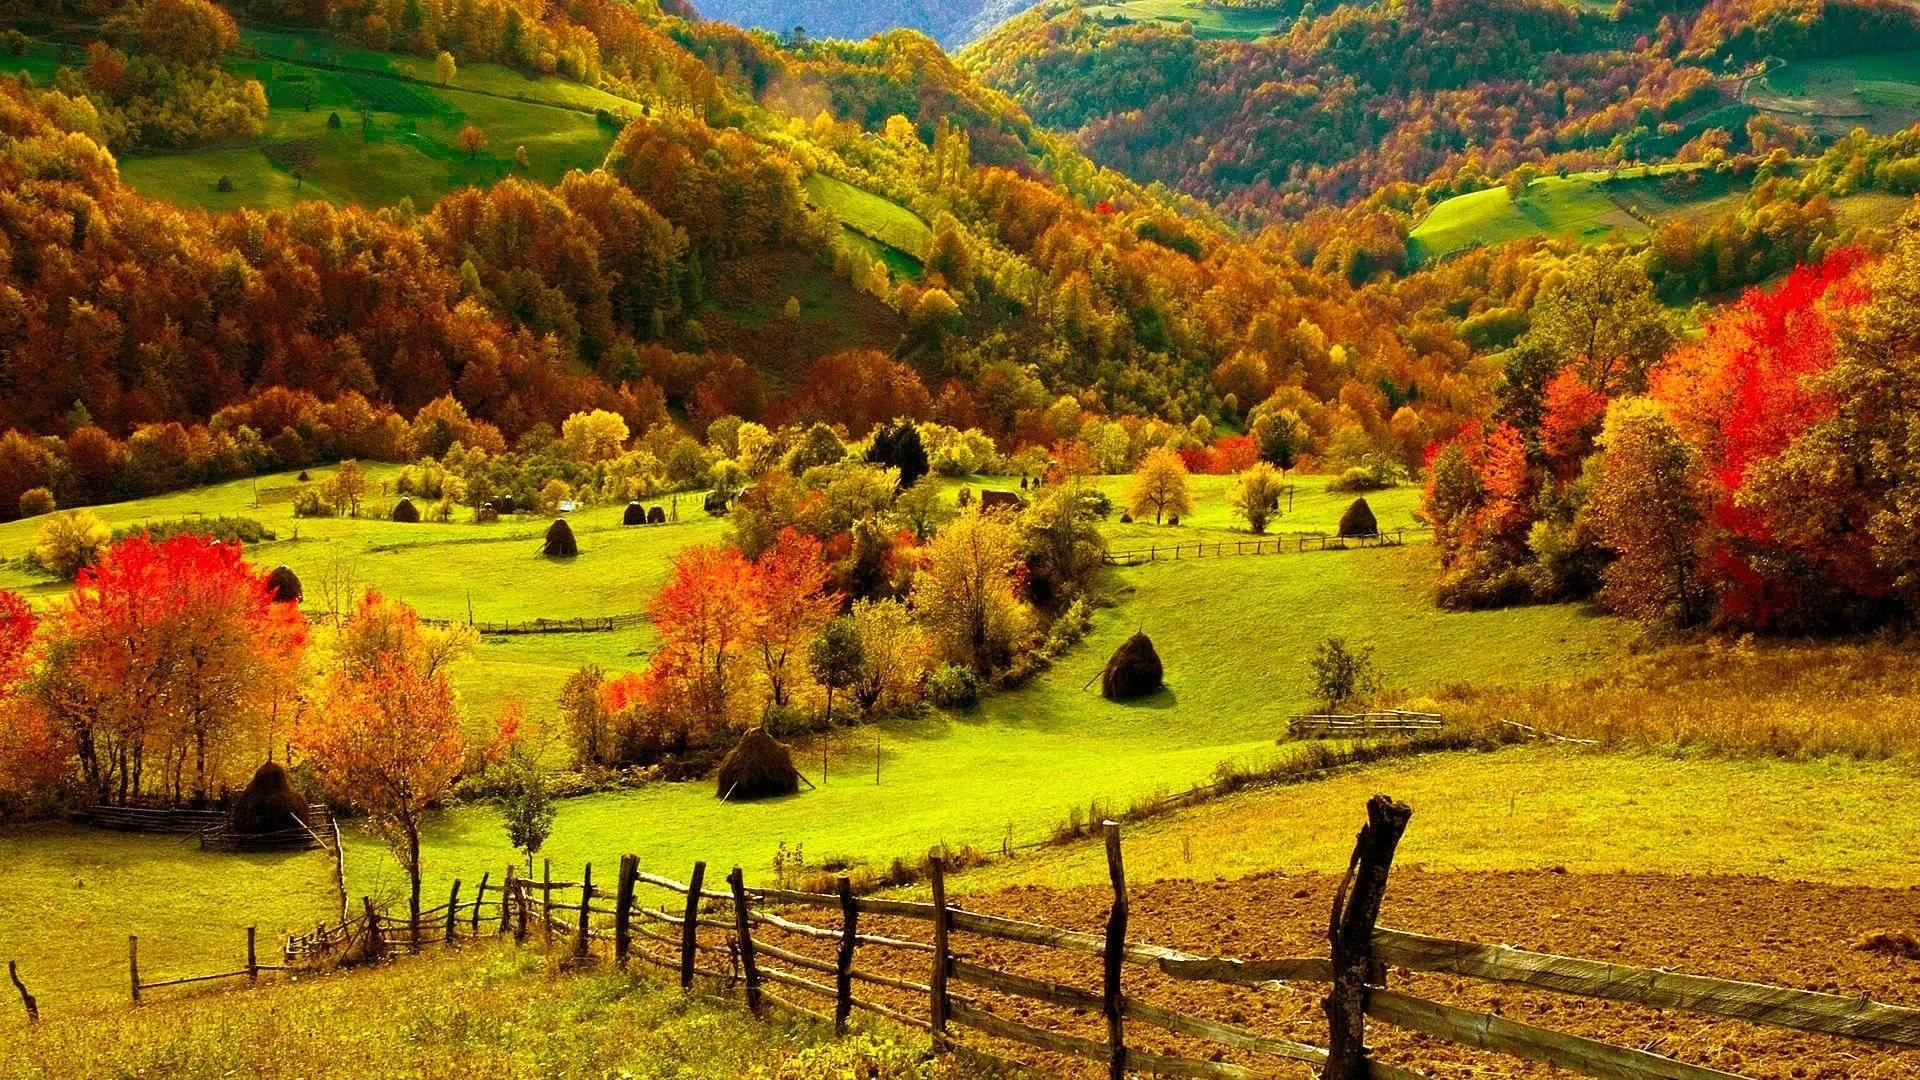 1920x1080 Pix For Fall Scenery Desktop Backgrounds